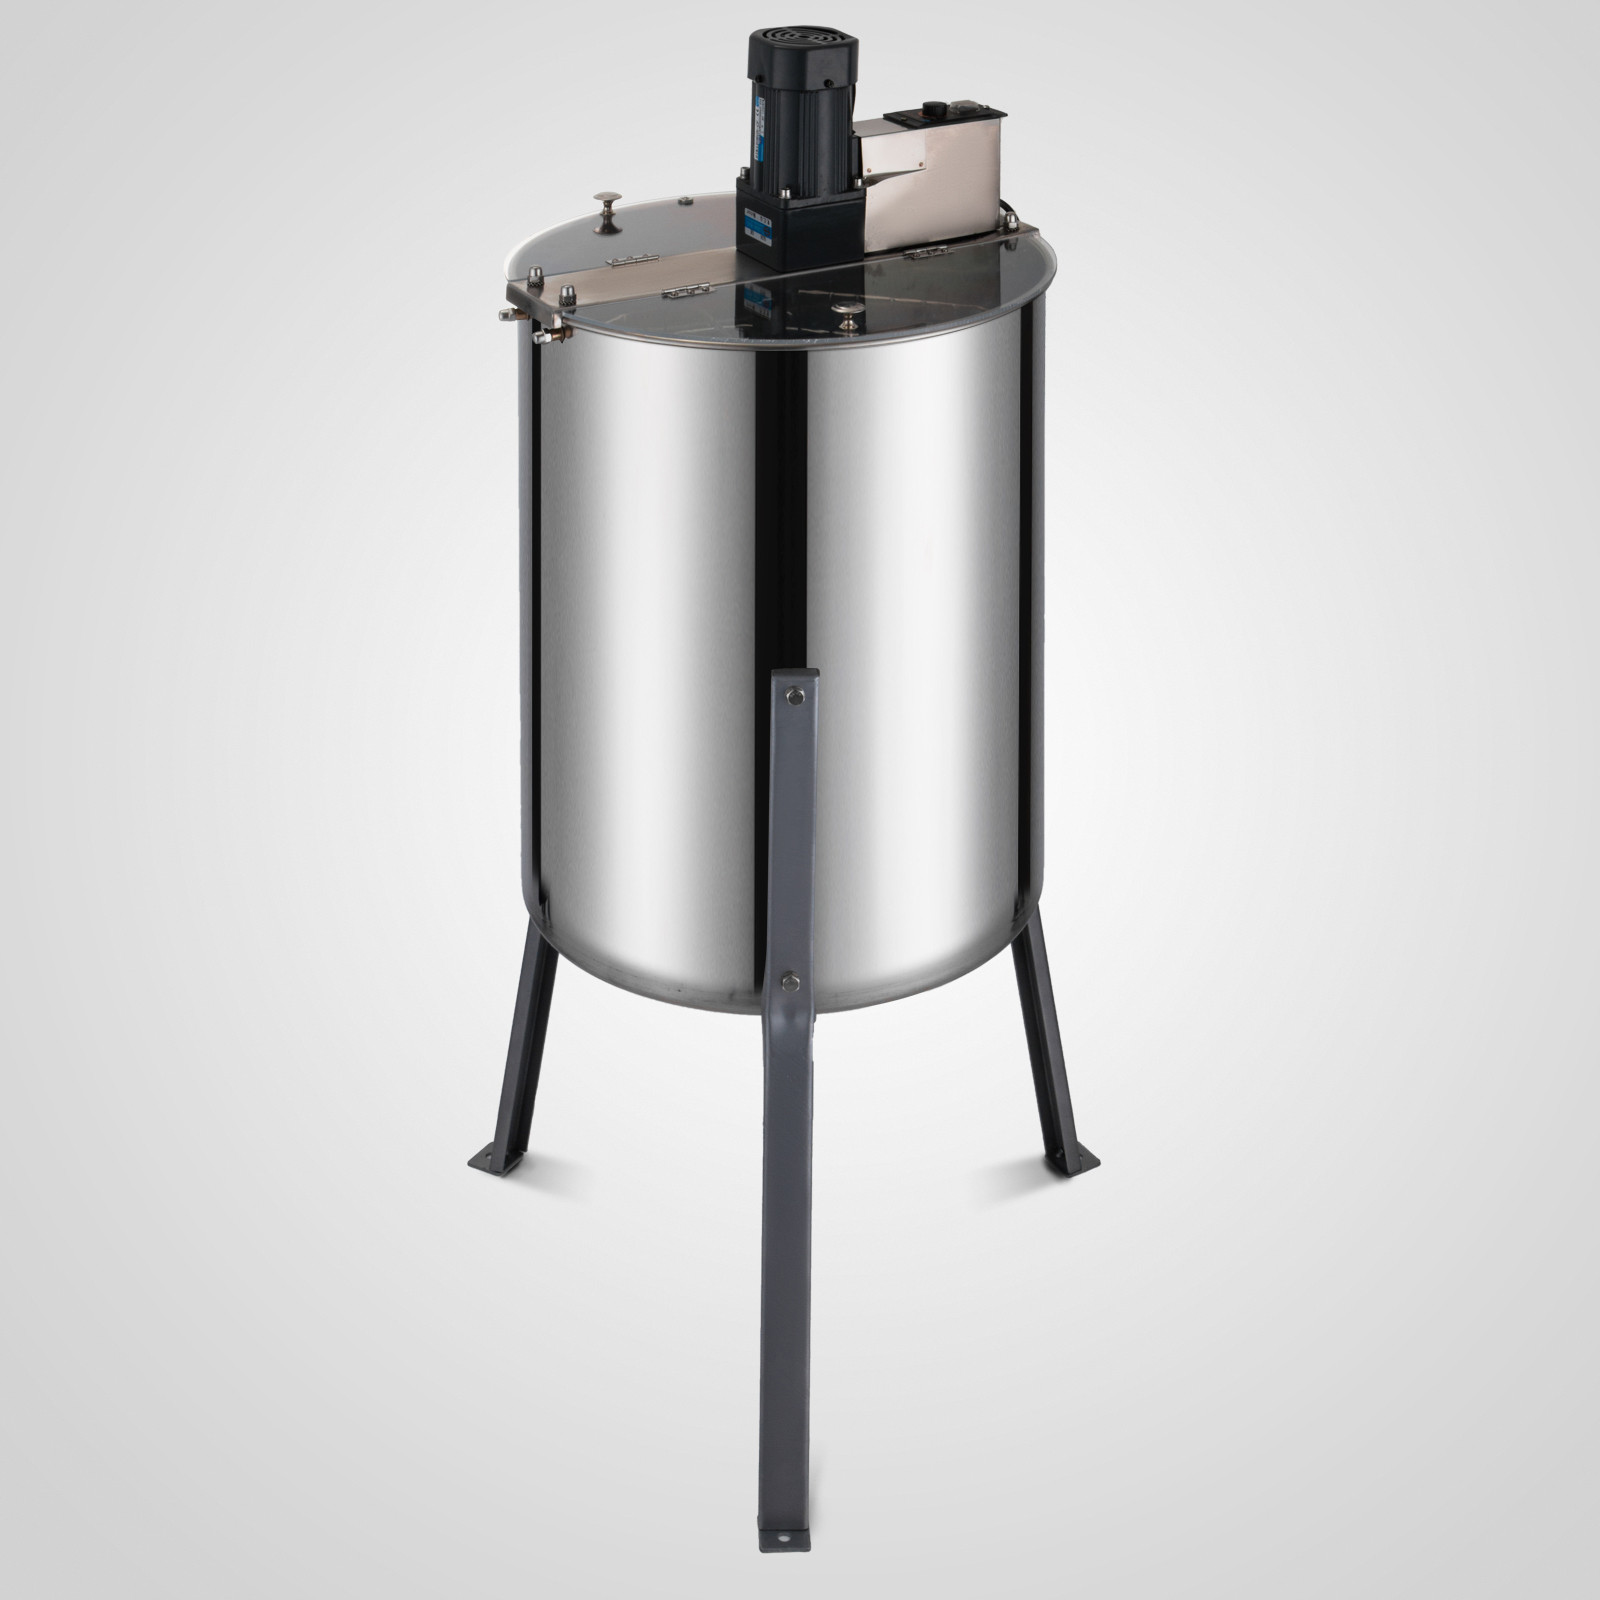 Extracteur-de-Miel-Electrique-manuelle-2-3-4-Cadres-En-Acier-Inox-Centrifugeuse miniature 66